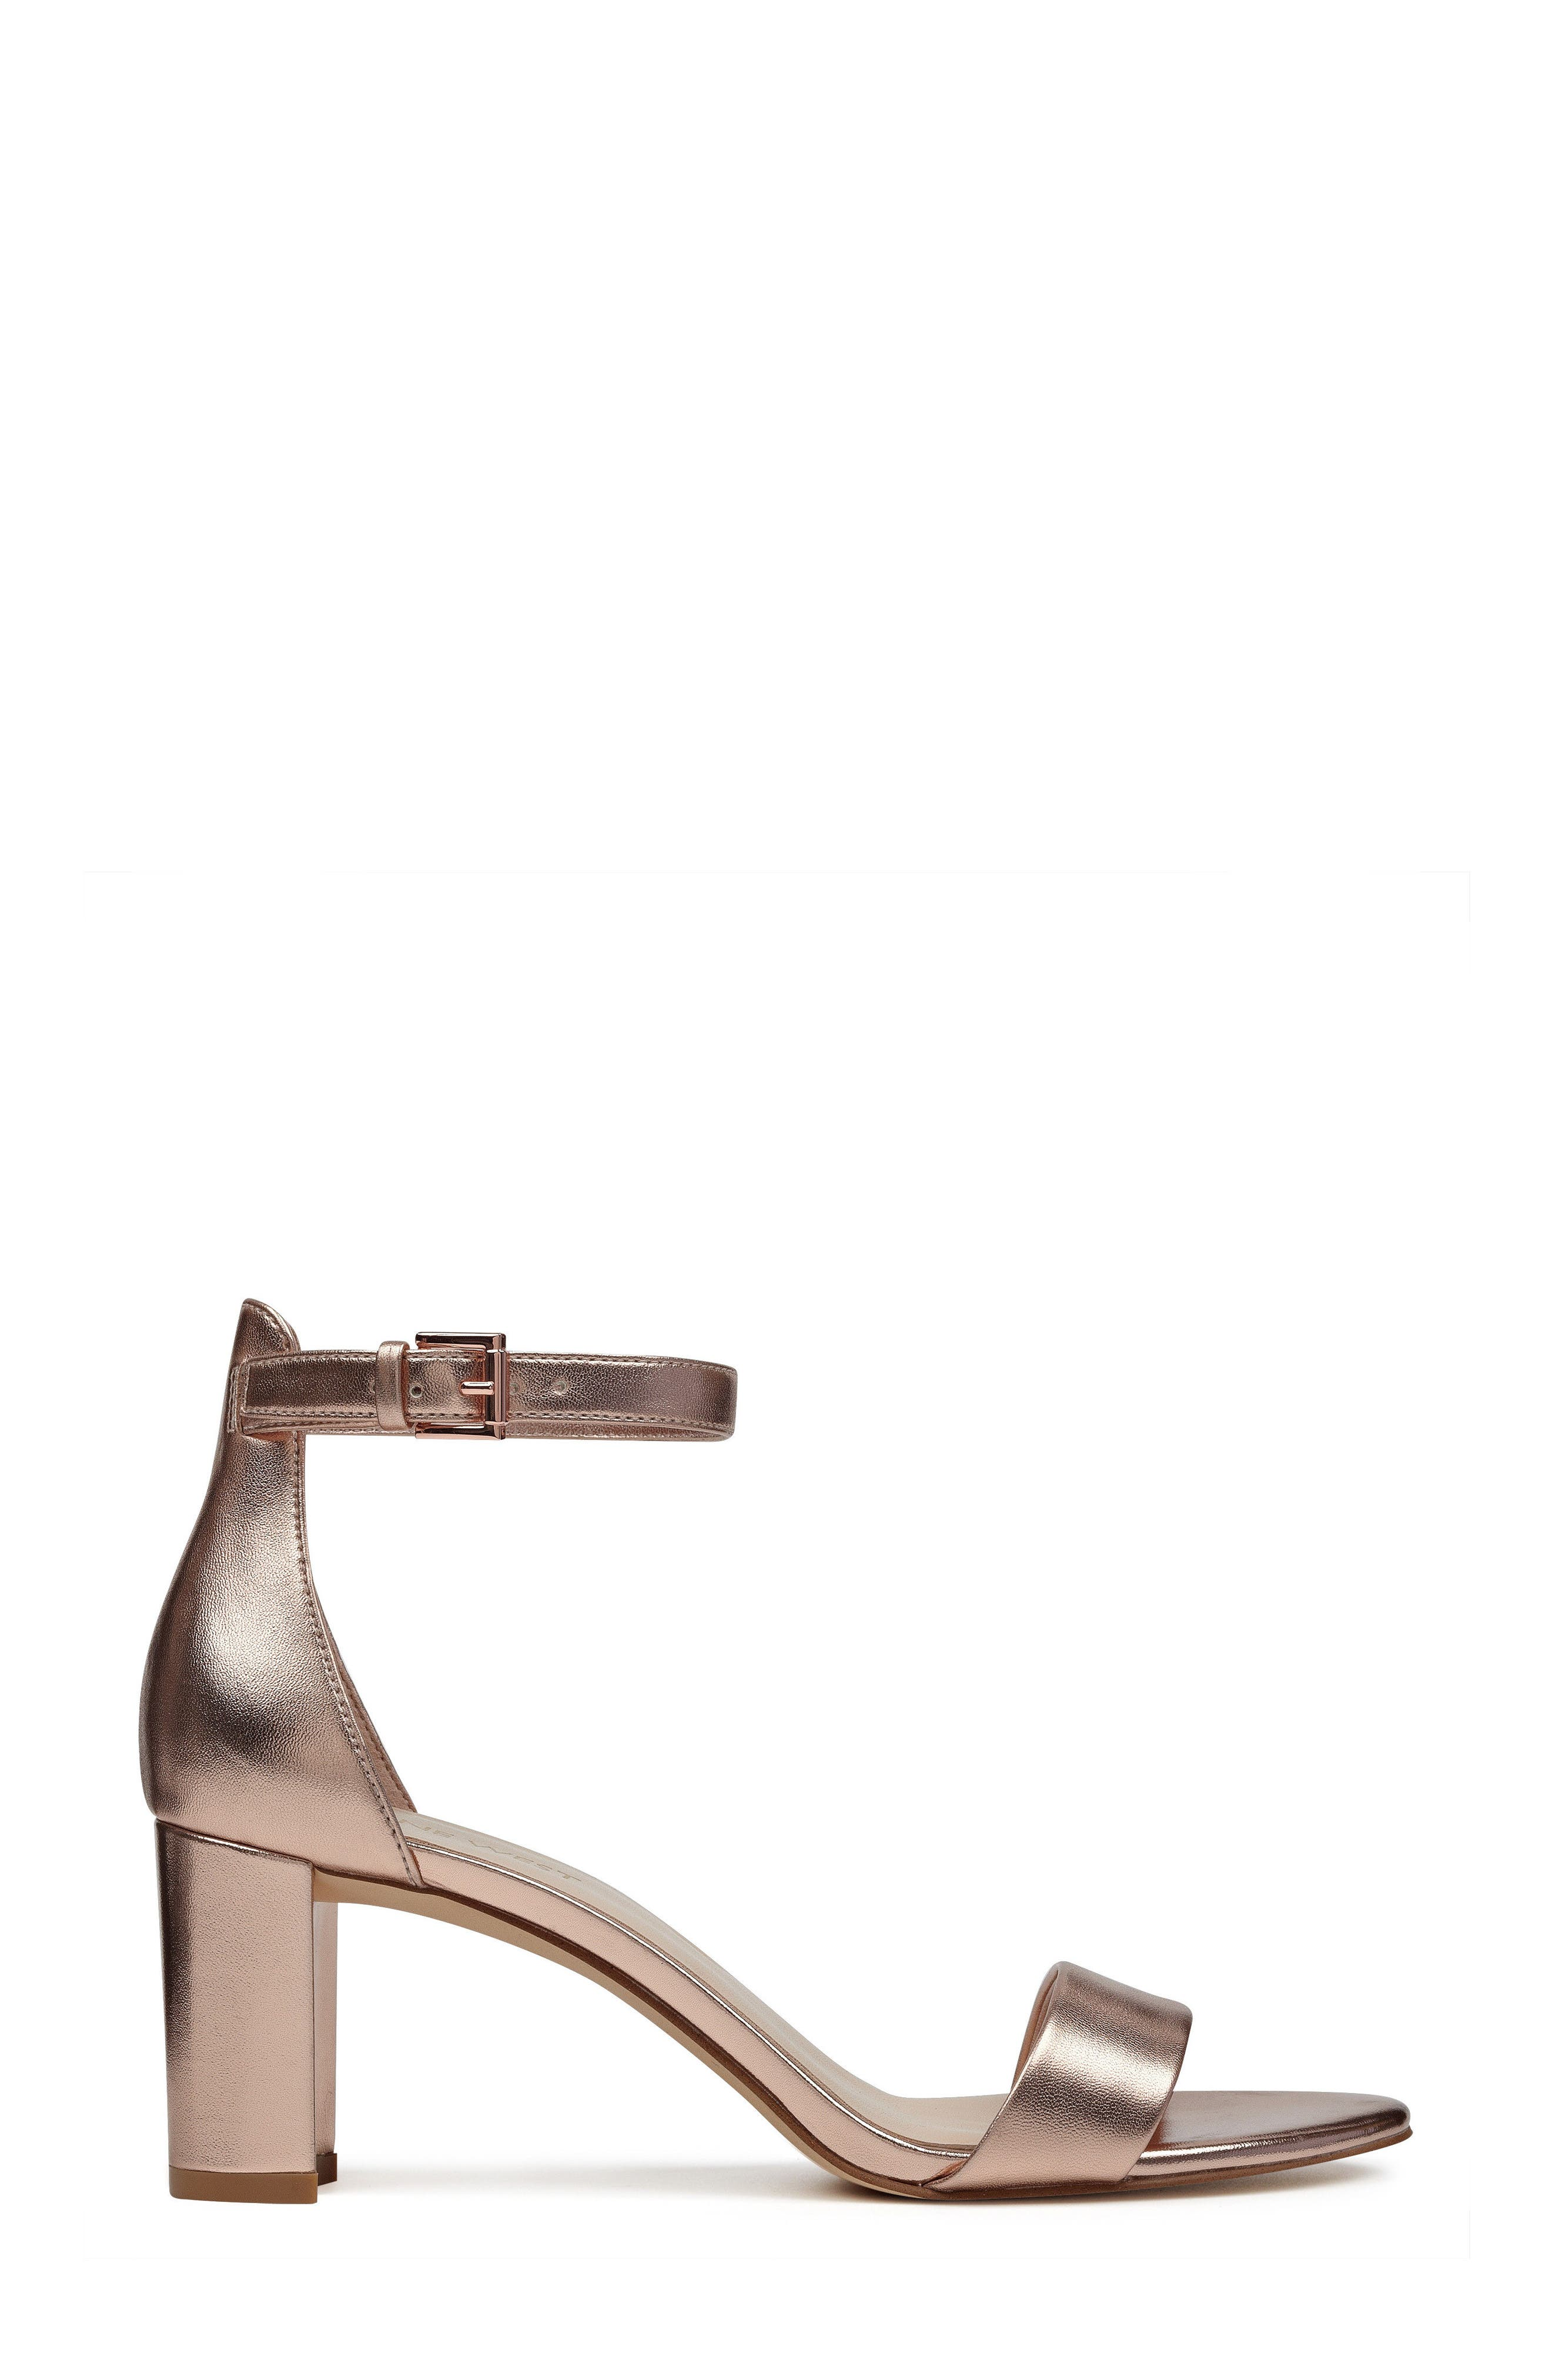 Pruce Ankle Strap Sandal,                             Alternate thumbnail 3, color,                             Matte Rose Gold